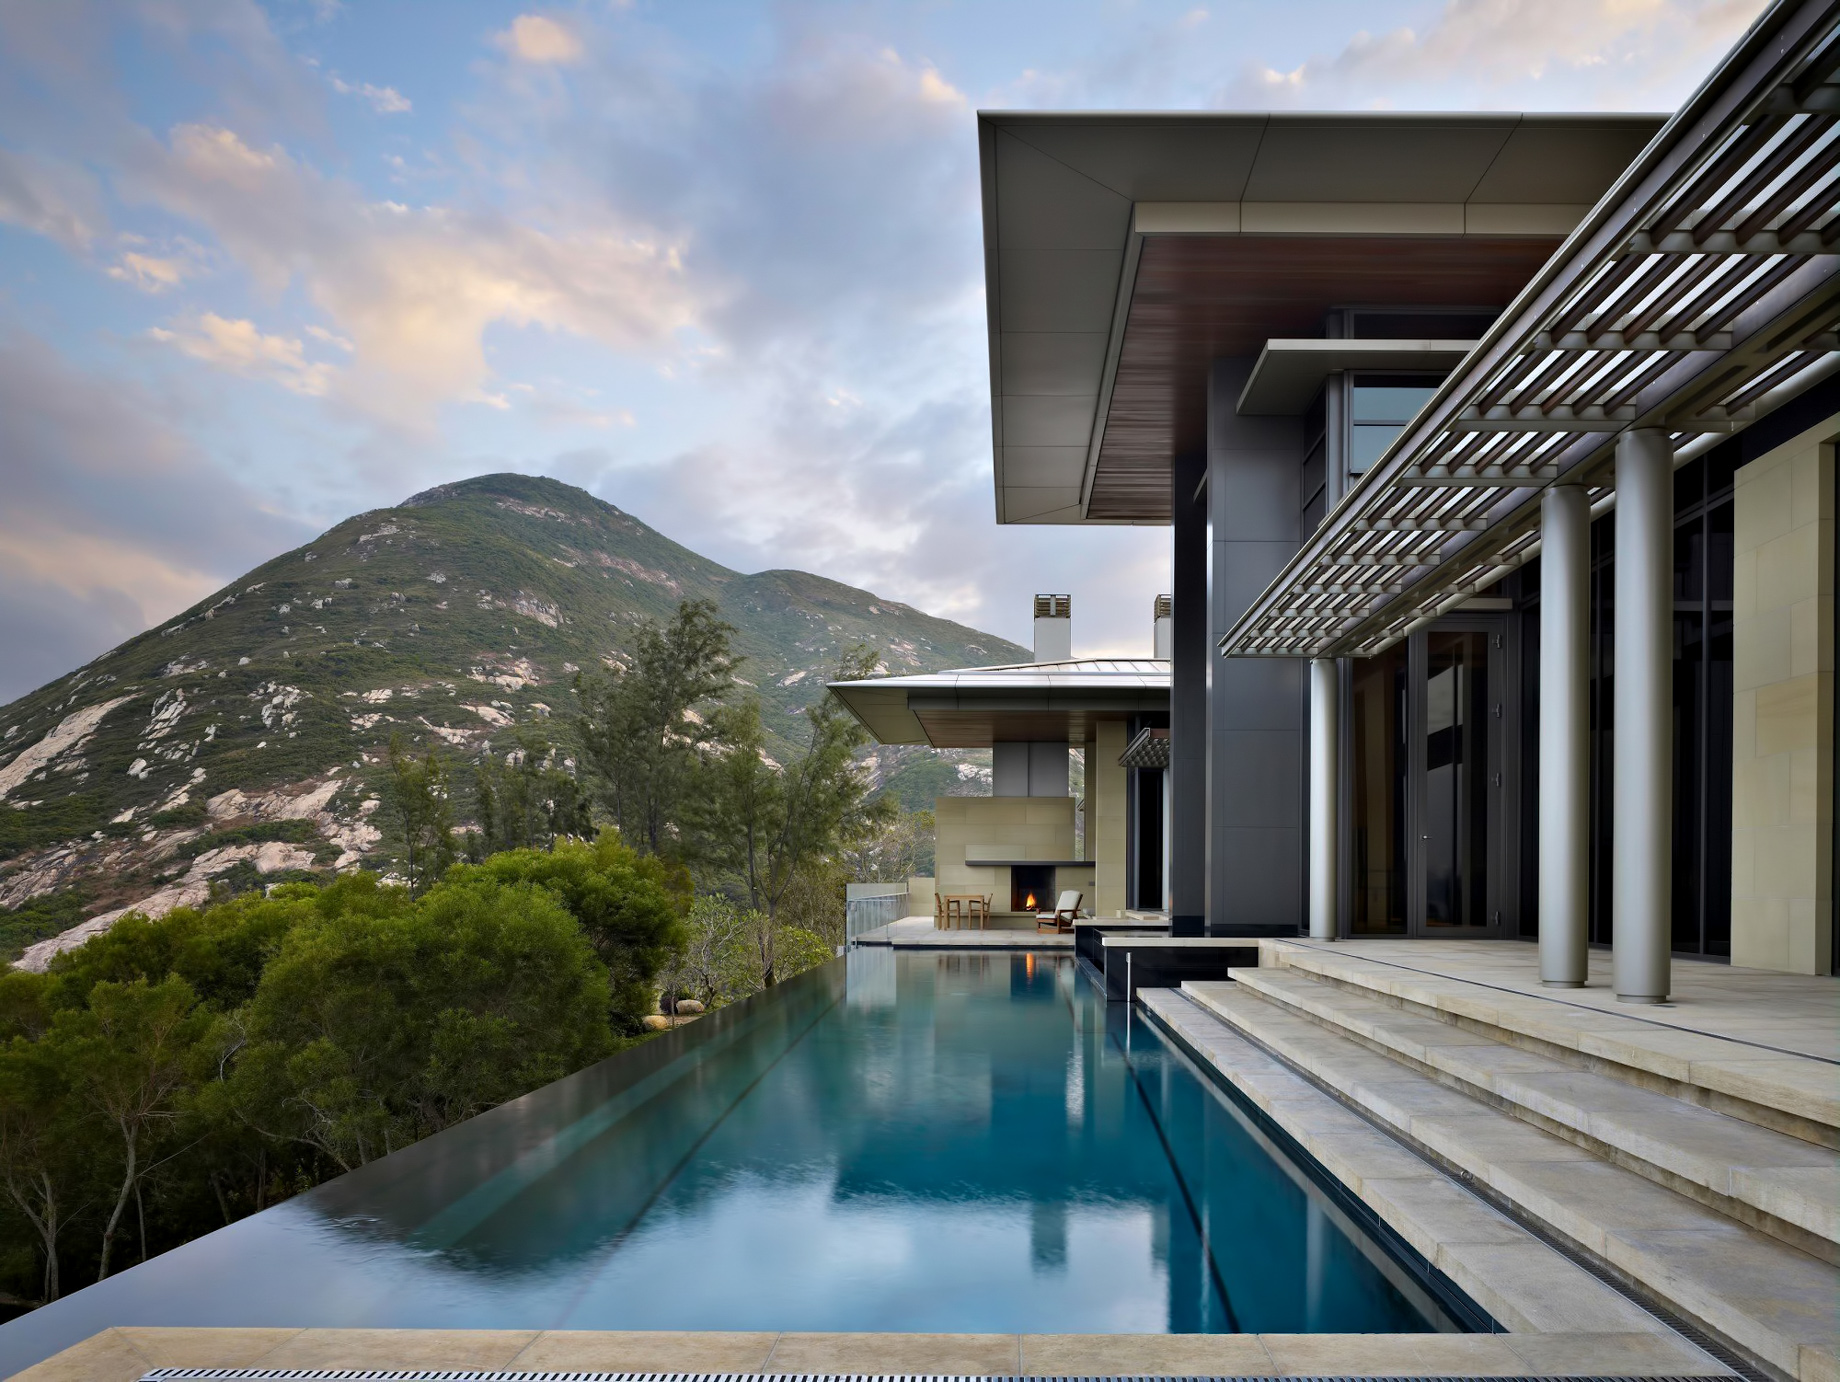 Hong Kong Luxury Villa – Shek O, Hong Kong, China